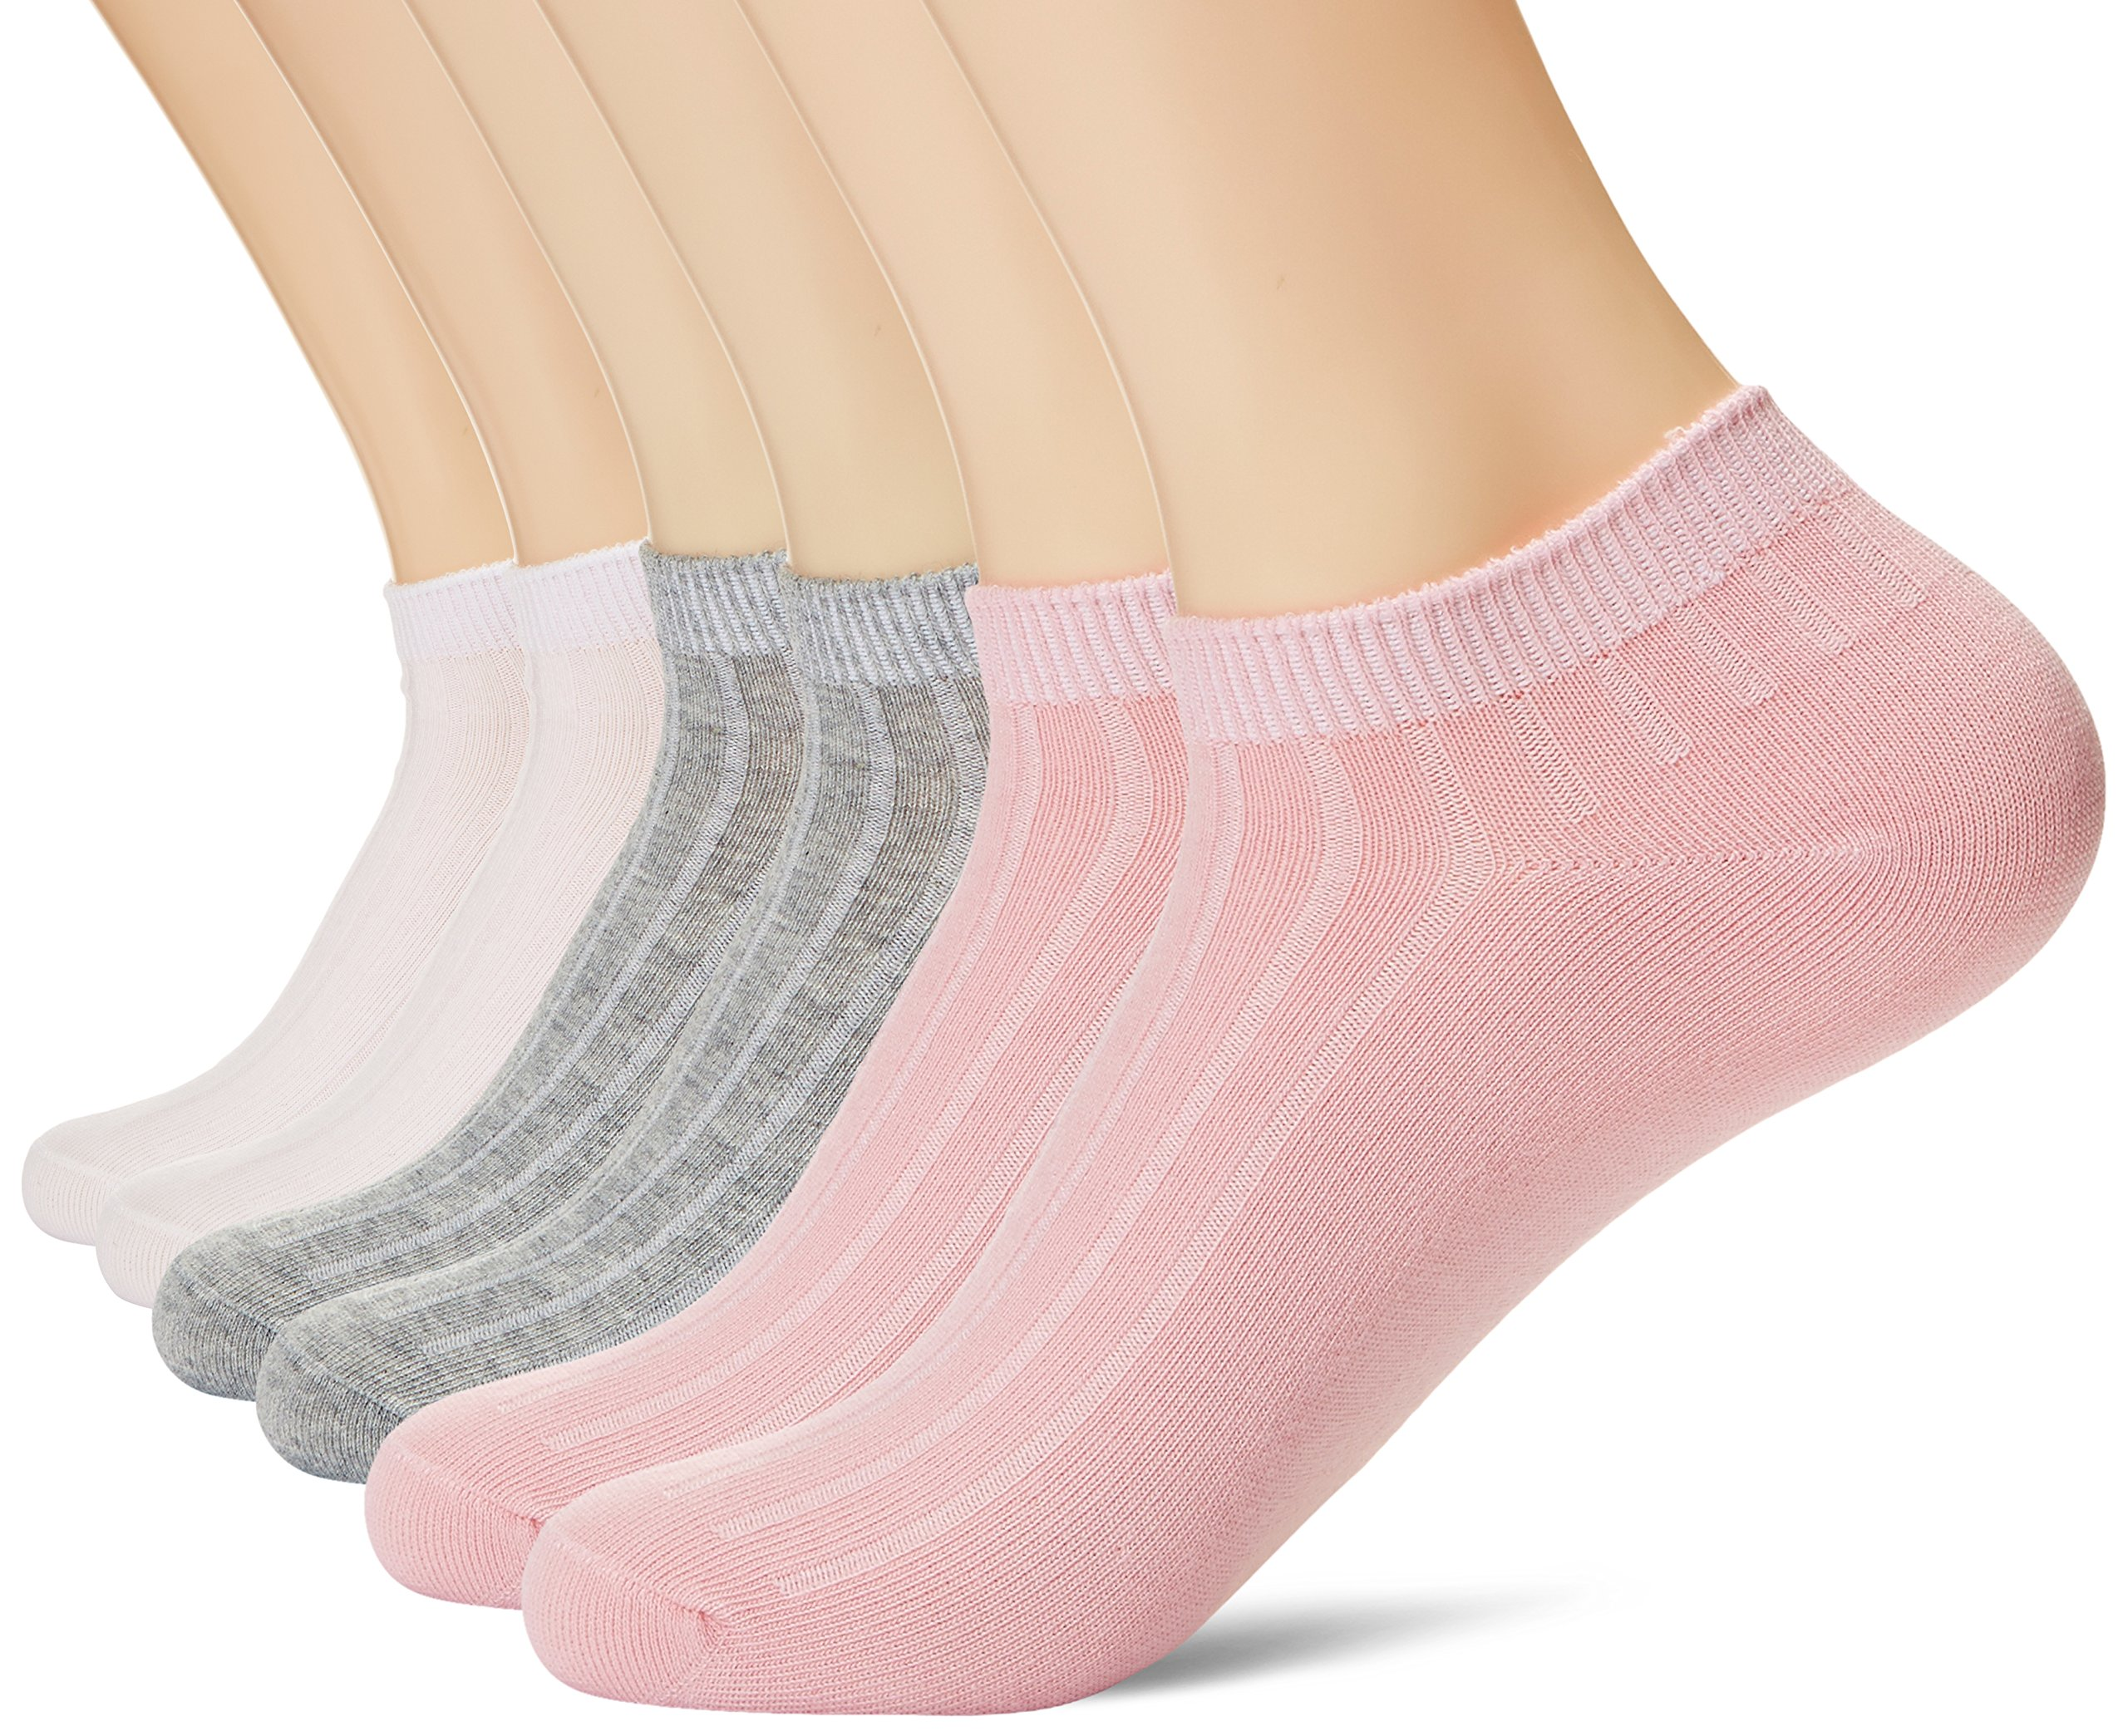 KOSY KOMFORT Womens Cotton 6-Pack Low Cut Ankle Socks Flat Boat Liner Socks FIT 6-10